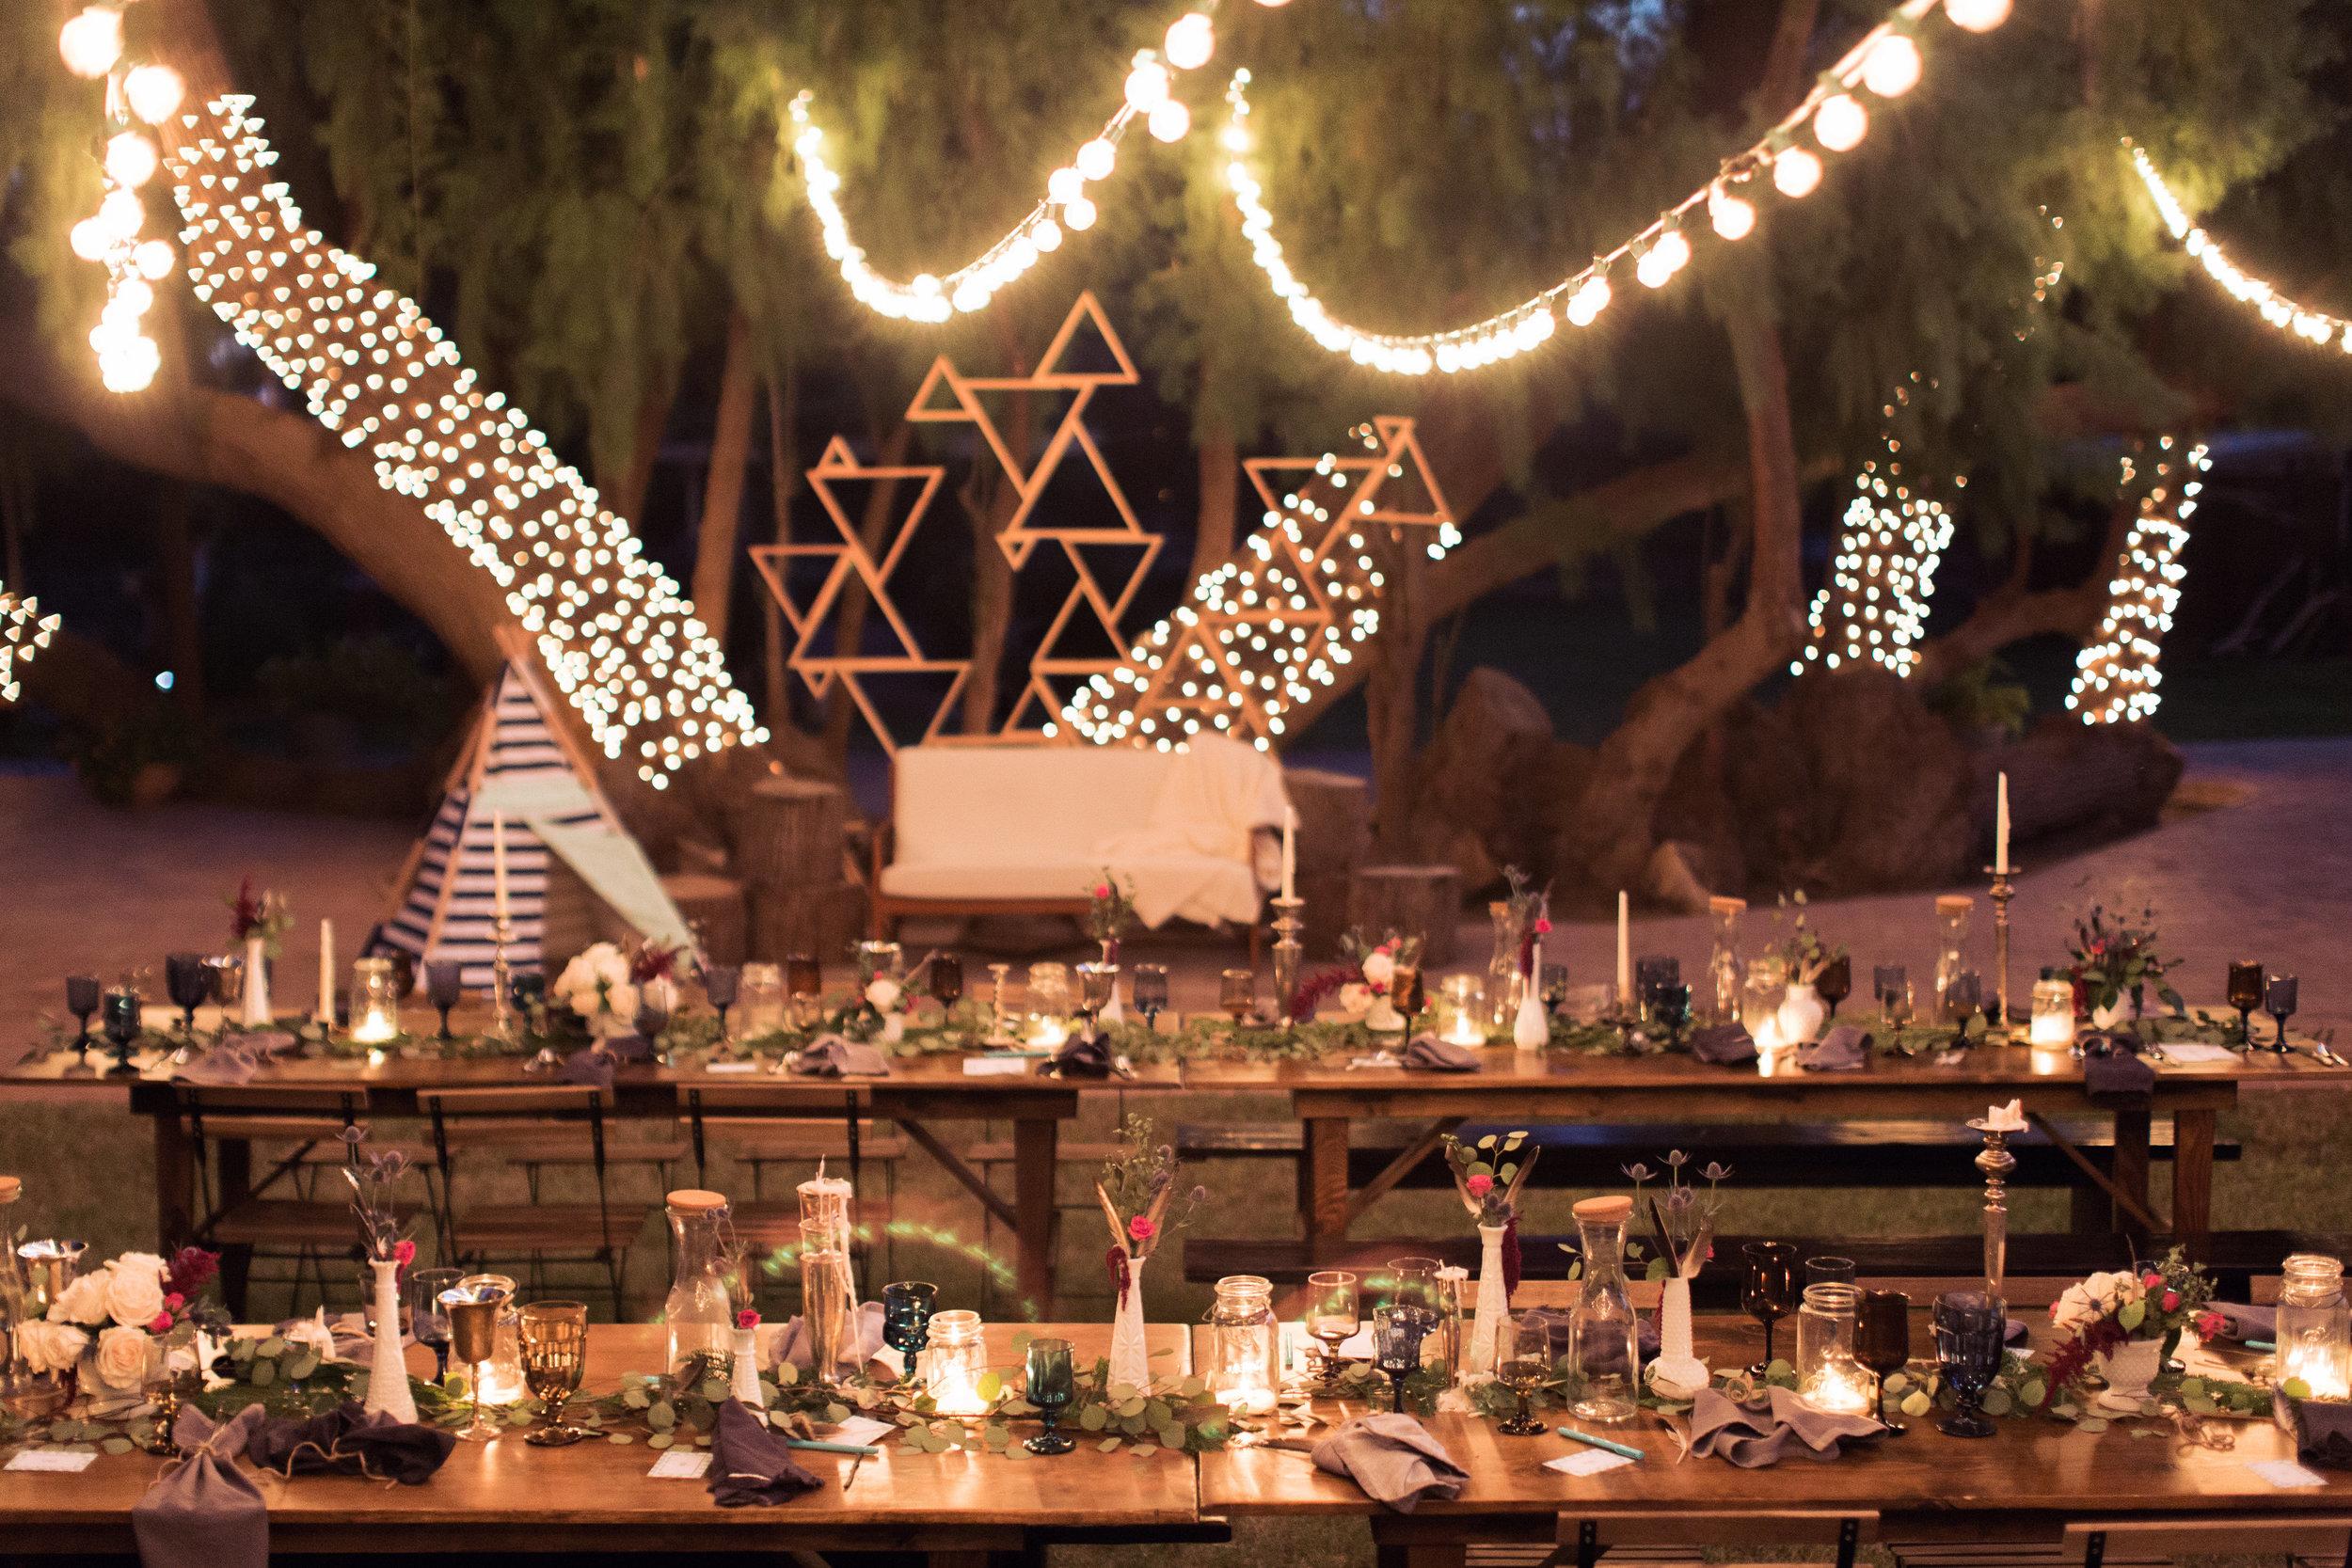 The Sweetest Arizona Baby Shower for Baby Becks - Konsider It Done- AZ Arizona Wedding & Event Planner, Designer, Coordinator Planning in Scottsdale, Phoenix, Paradise Valley, Tempe, Gilbert, Mesa, Chandler, Tucson, Sedona